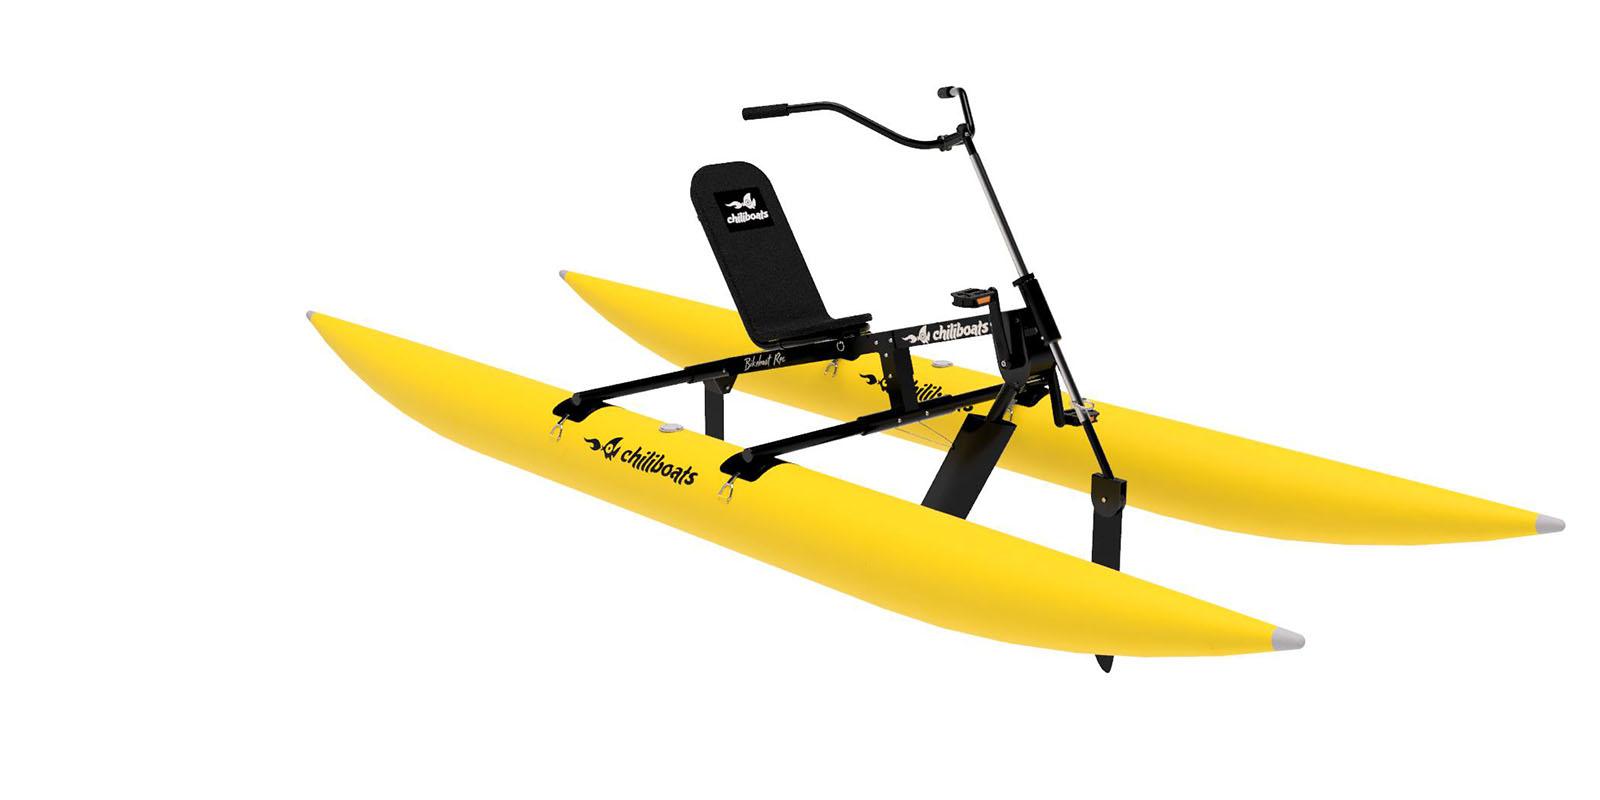 Chiliboats High Performance Waterbikes